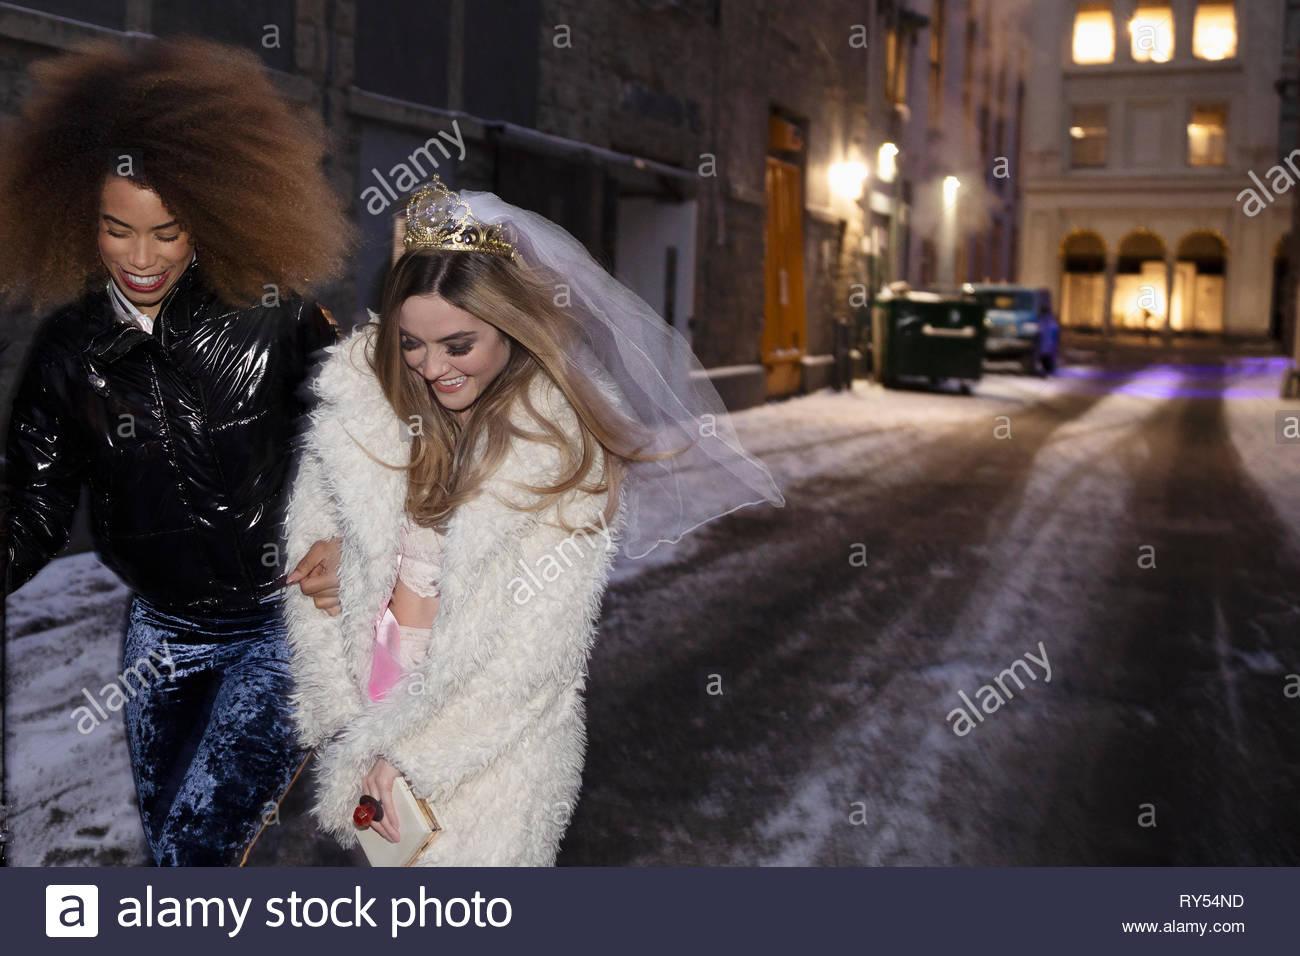 Bachelorette and friend walking on snowy urban street - Stock Image